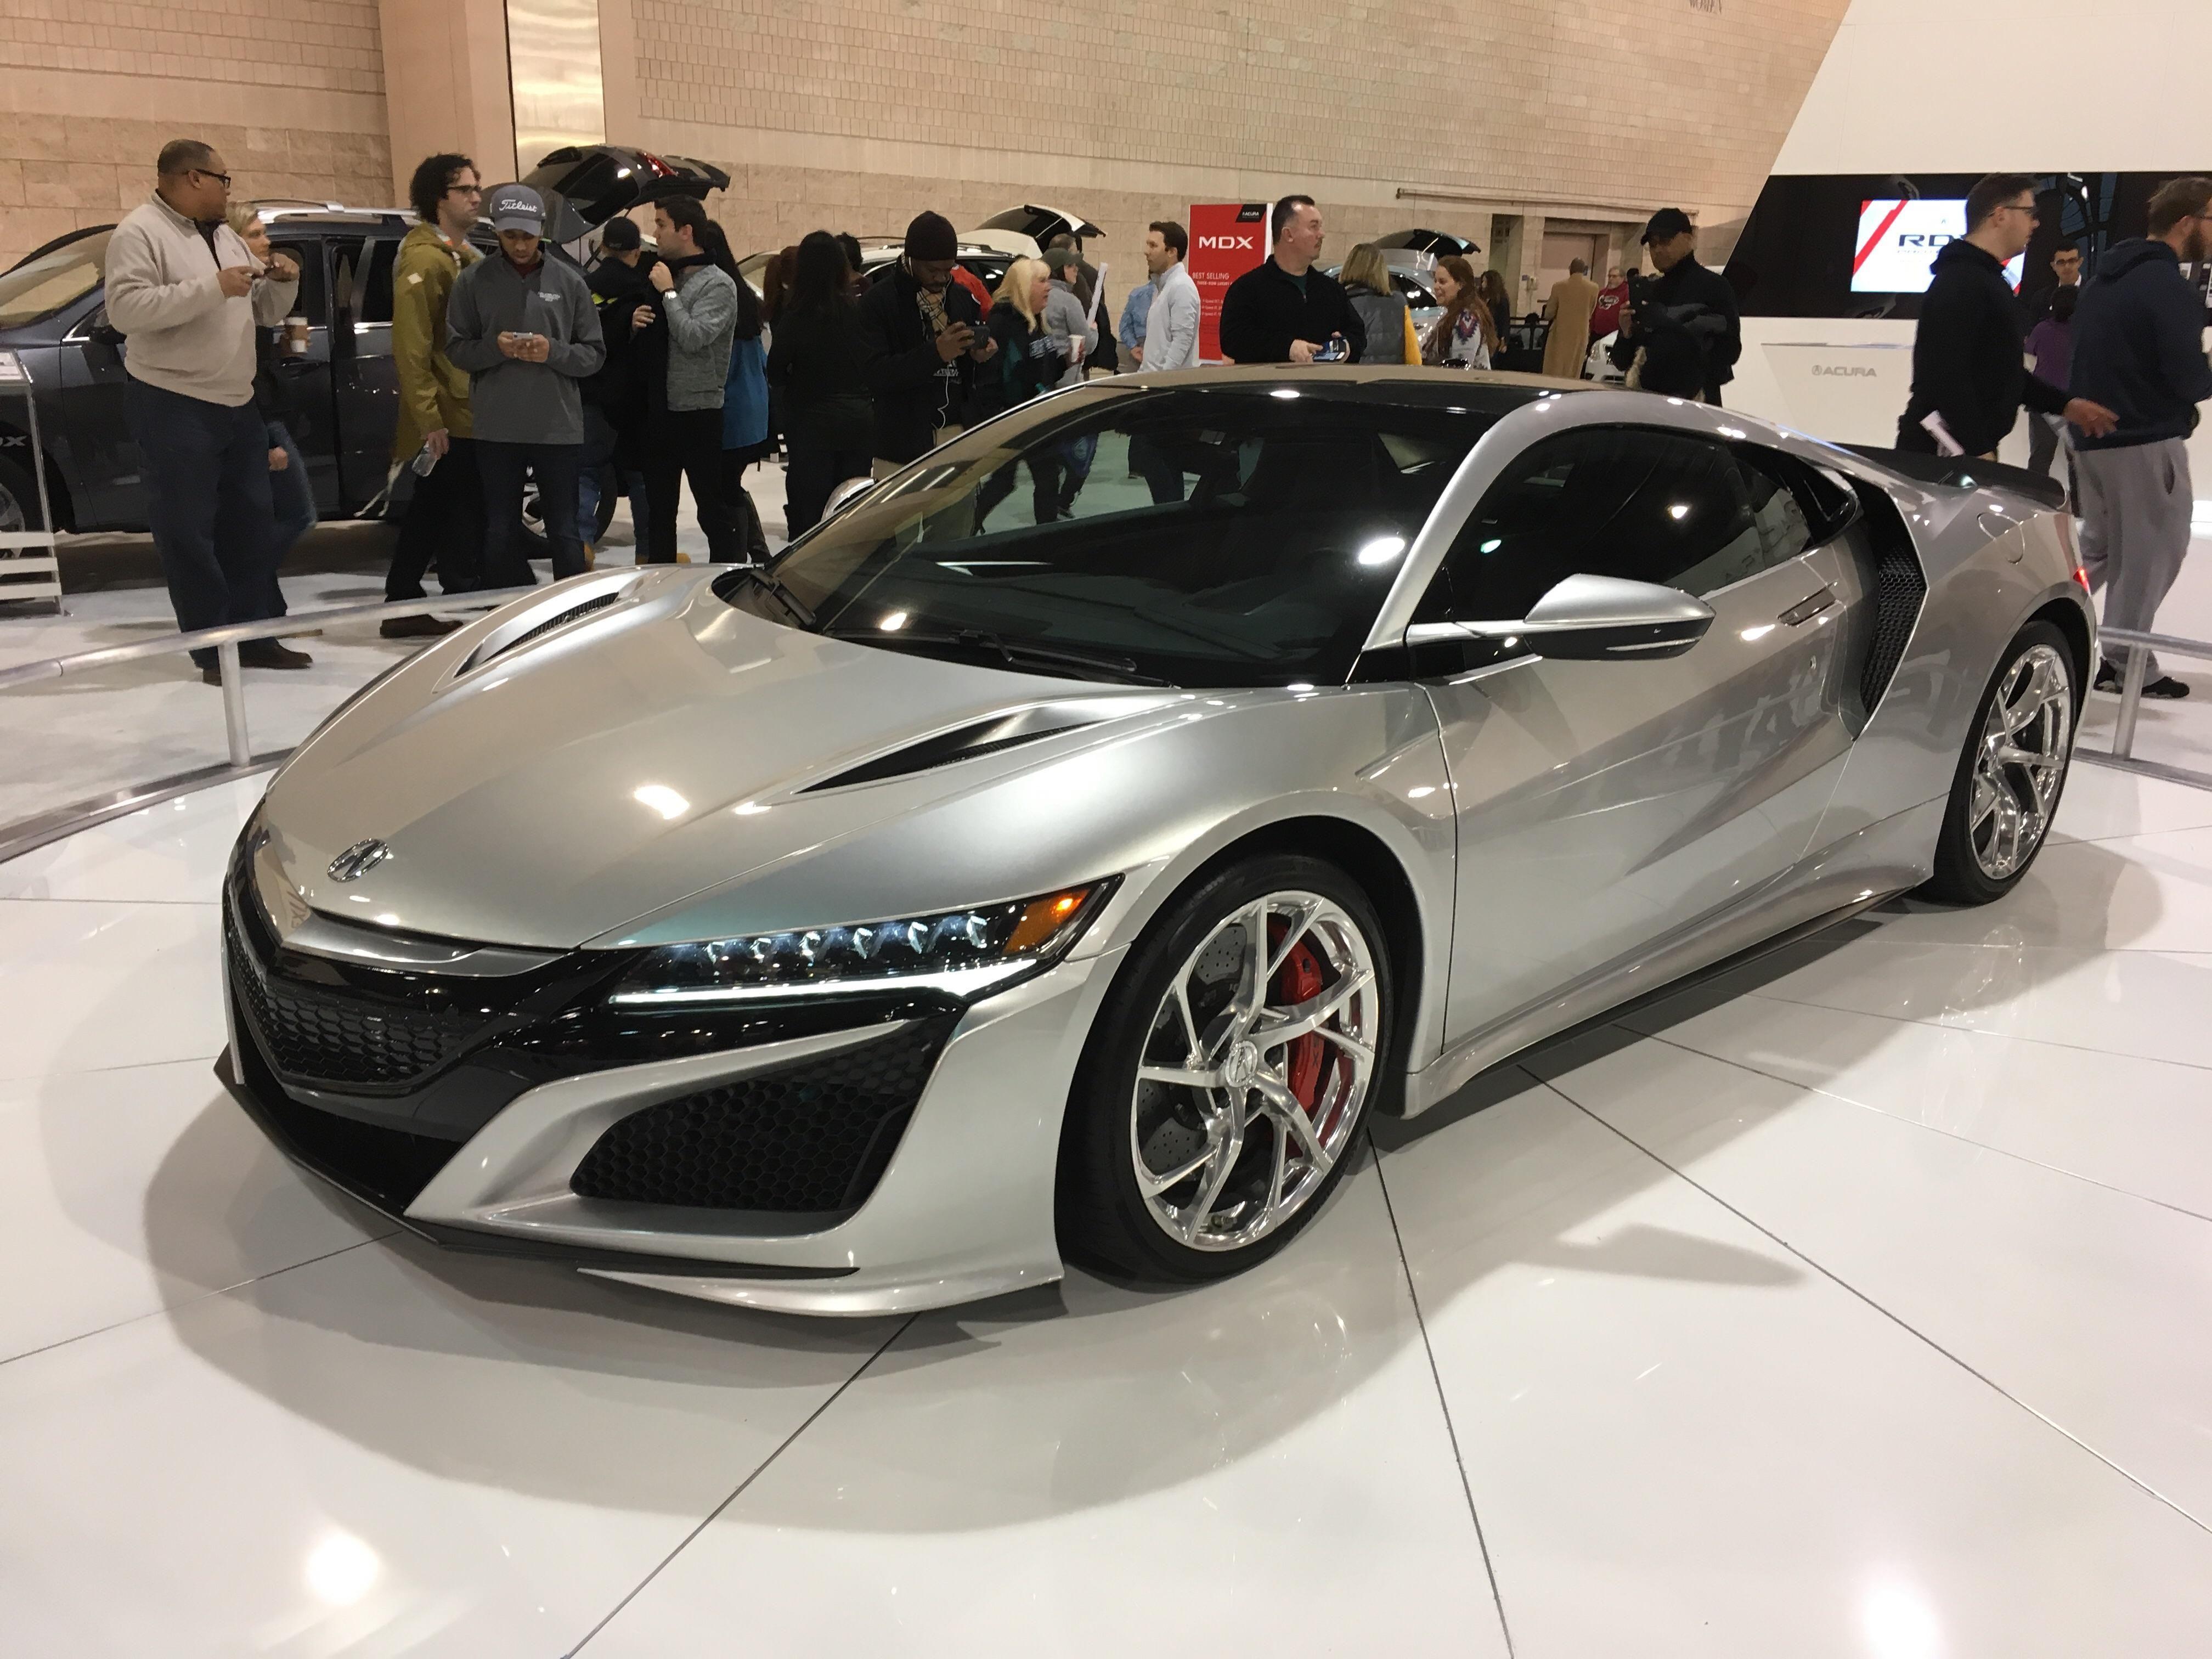 2017 Acura NSX Philadelphia Car Show Reddit Credit rockzter928